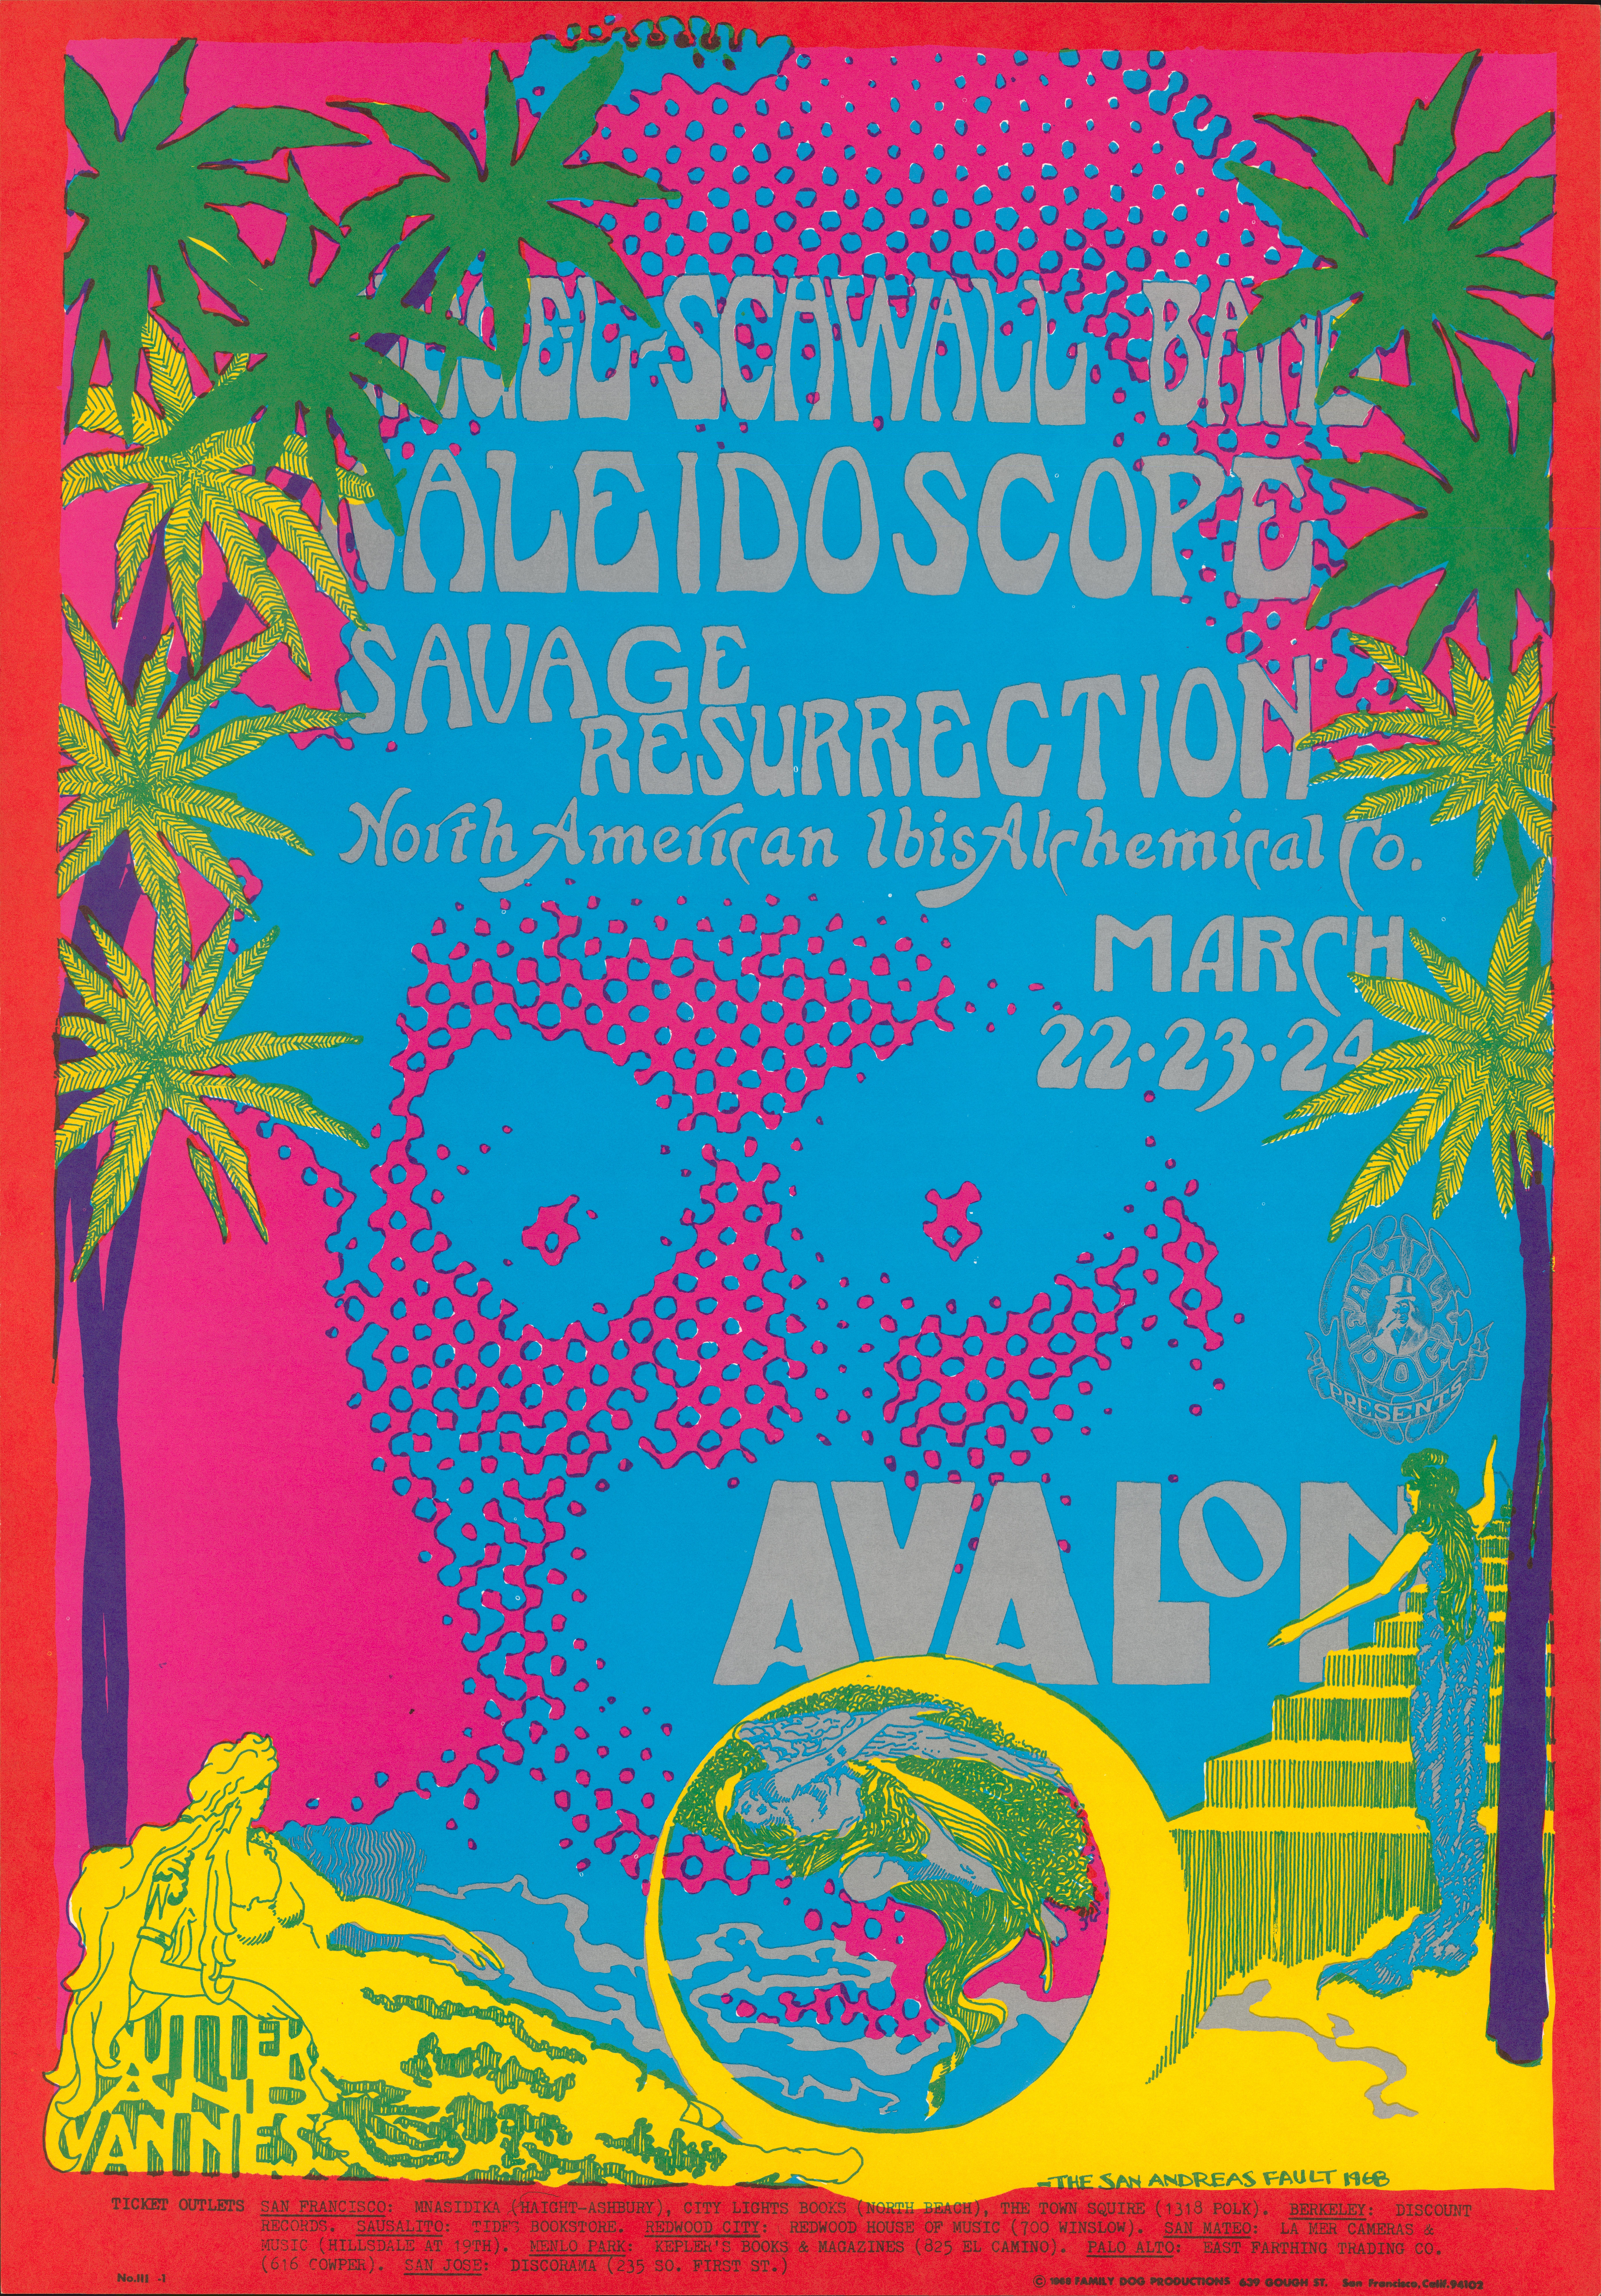 Kaleidoscope (USA) FD111-PO